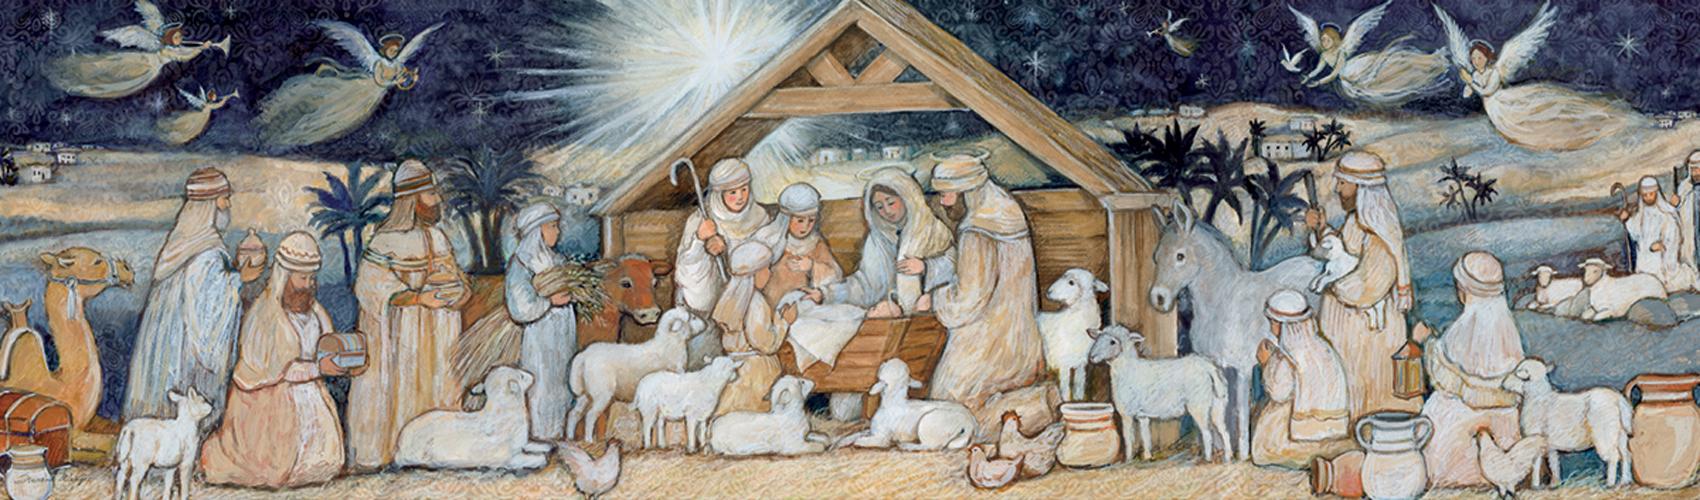 Nativity Set Religious Jigsaw Puzzle